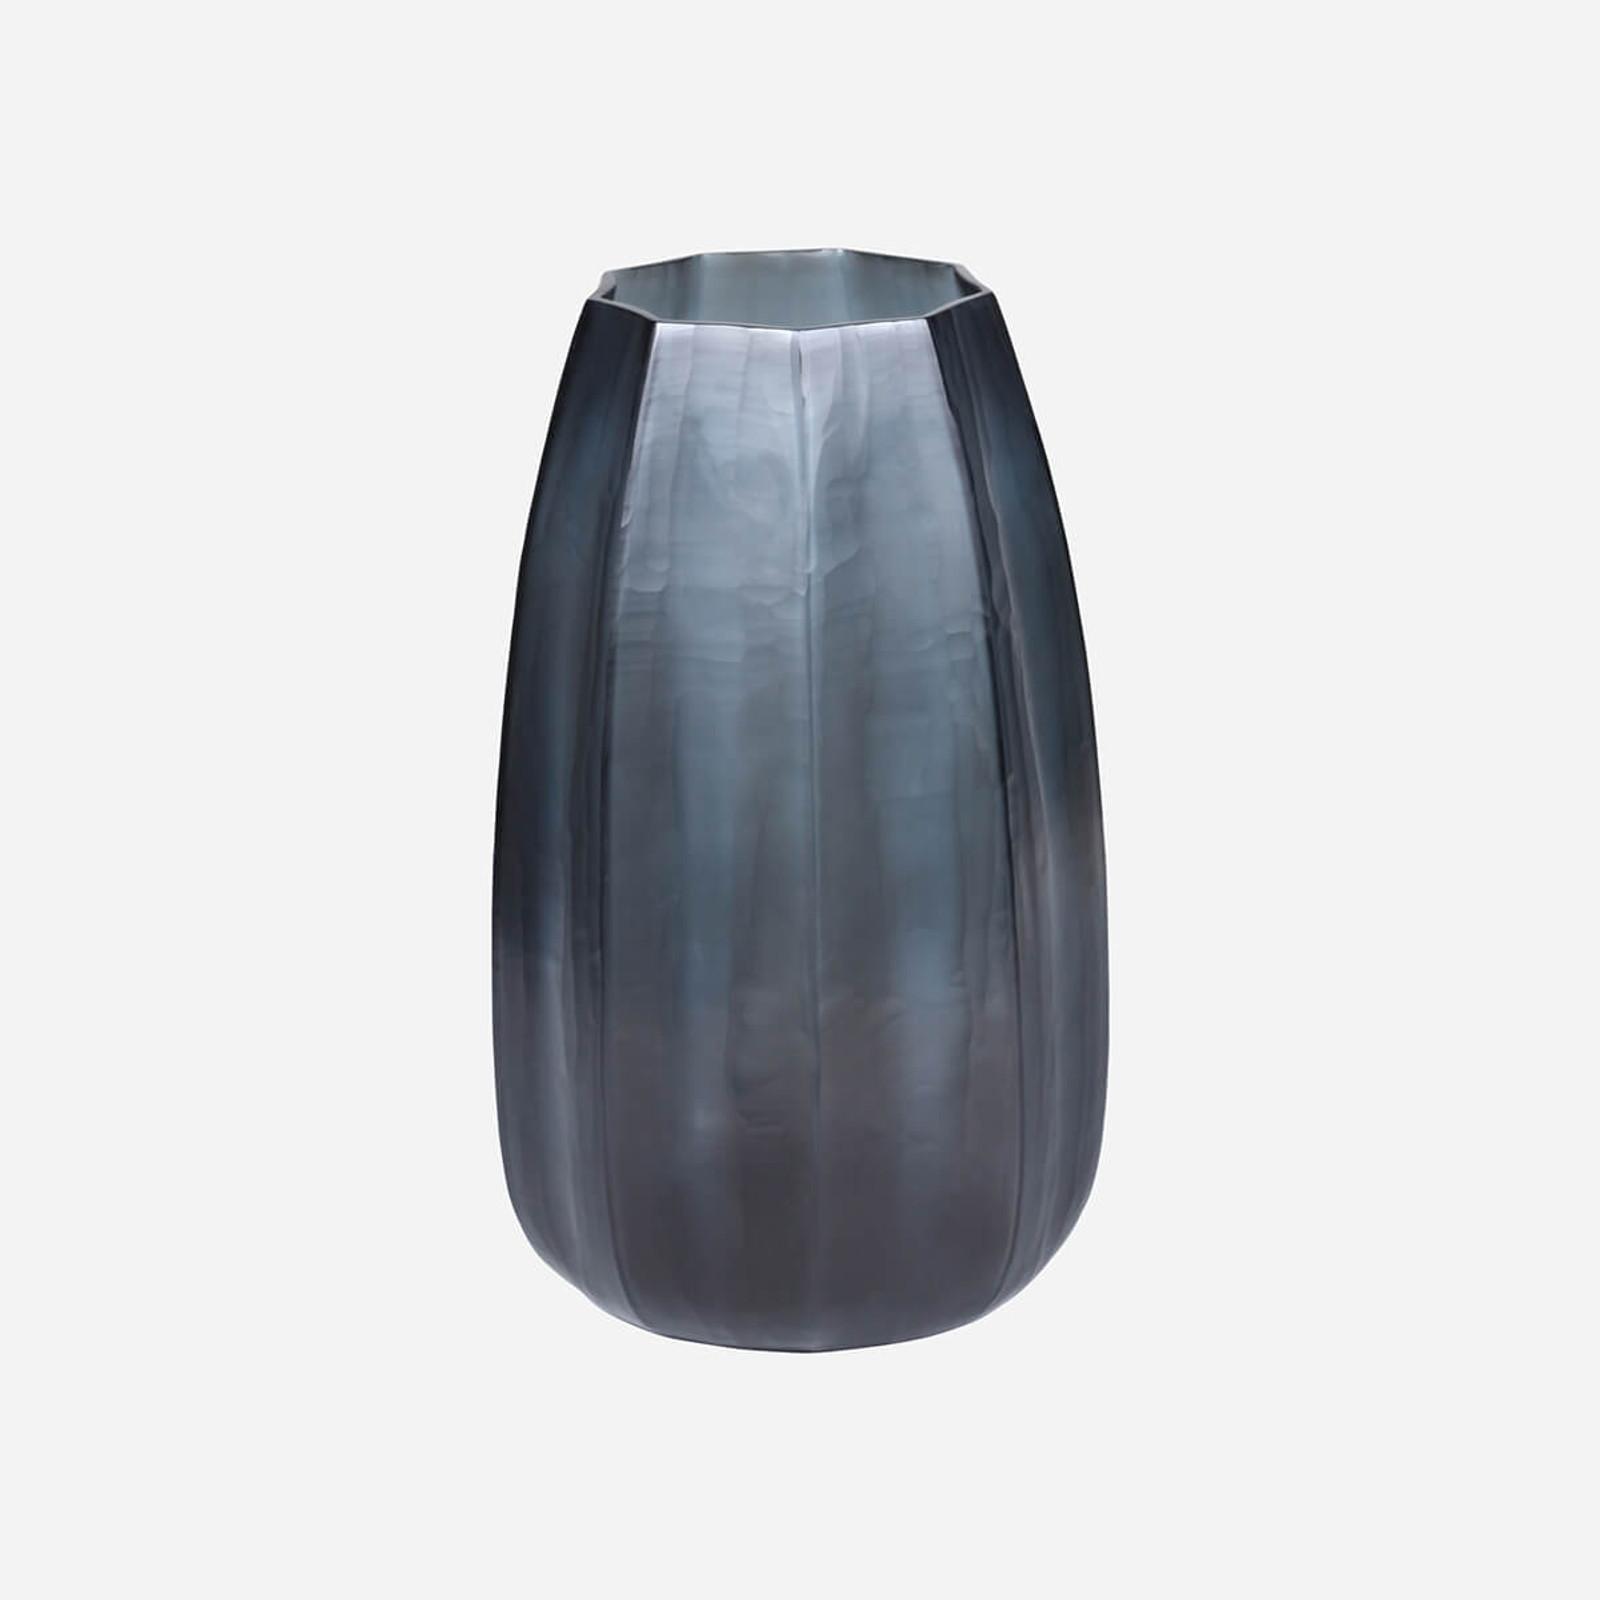 Loire XL Vase, Indigo